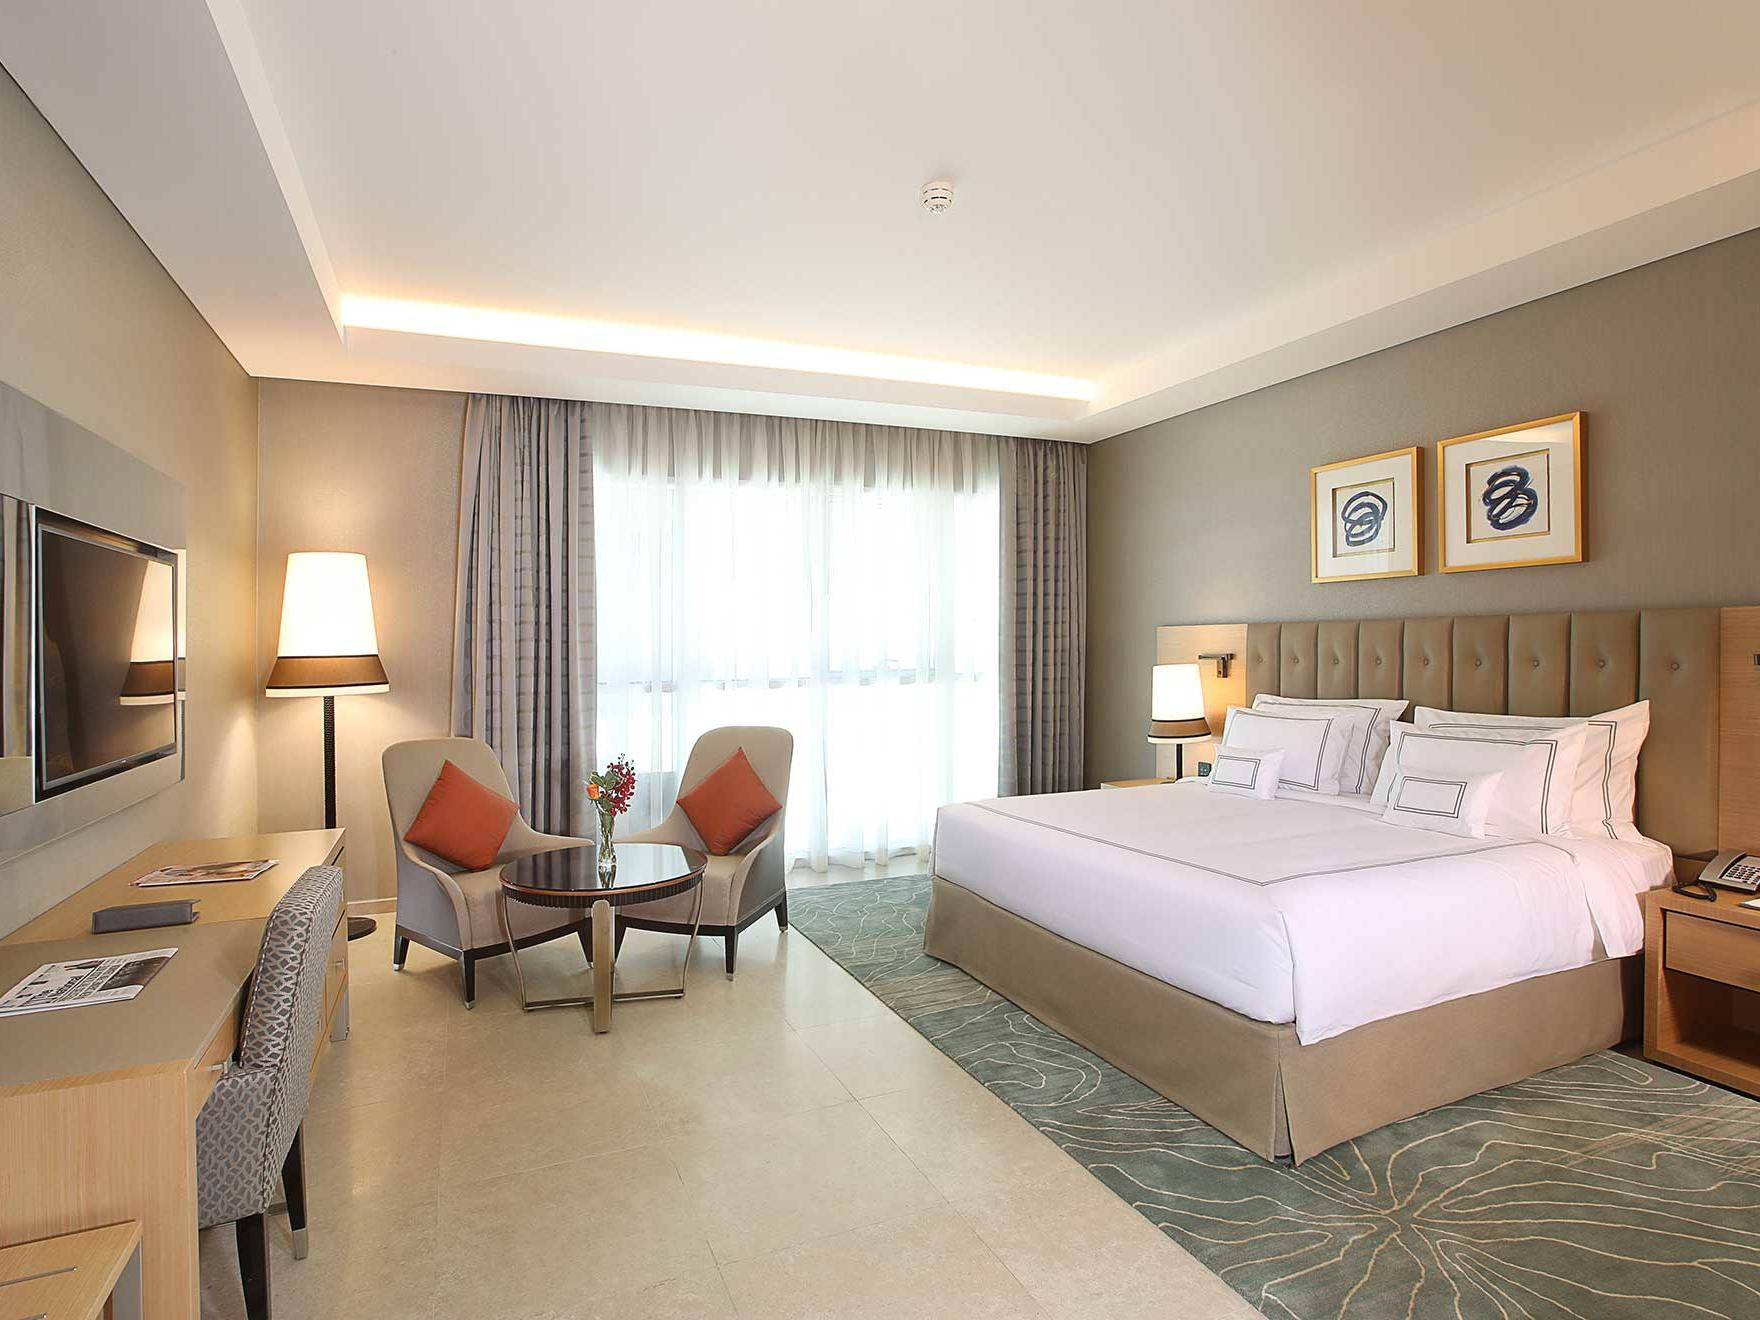 Superior Room at Grand Cosmopolitan Hotel in Dubai